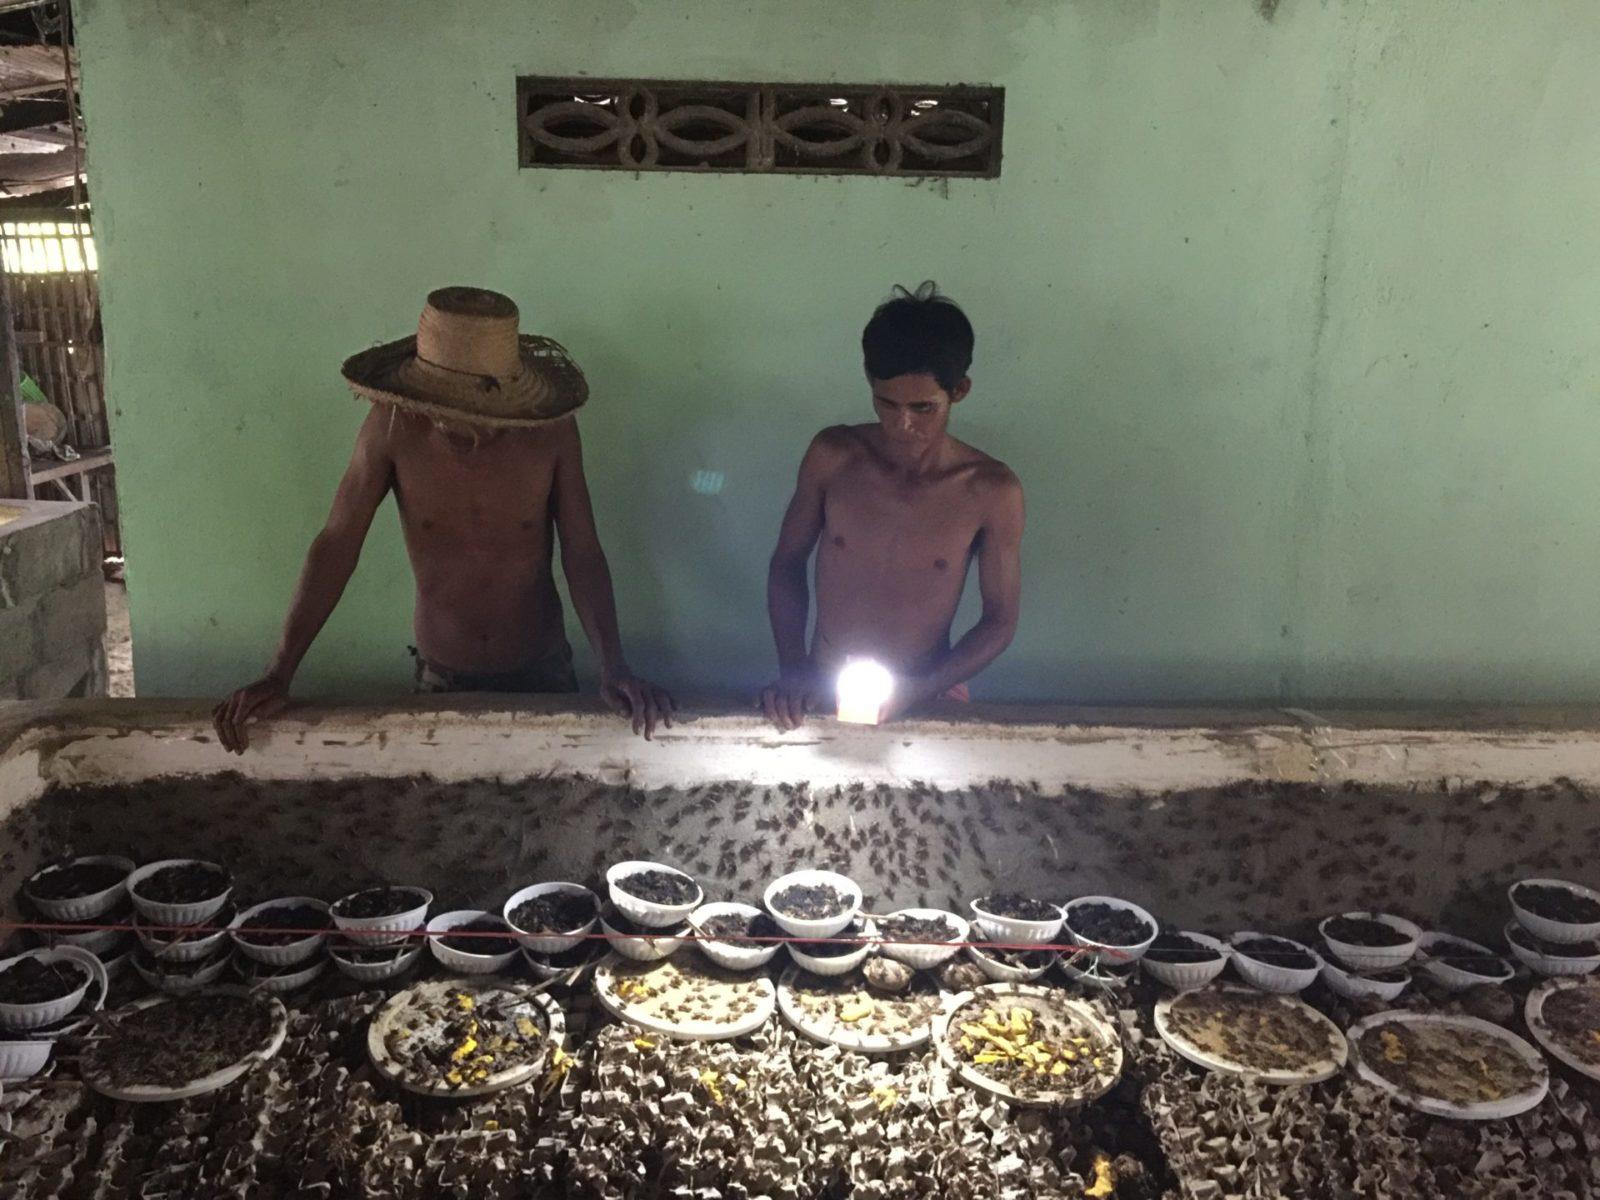 Kambodscha Grillenzucht Ernährungssicherheit